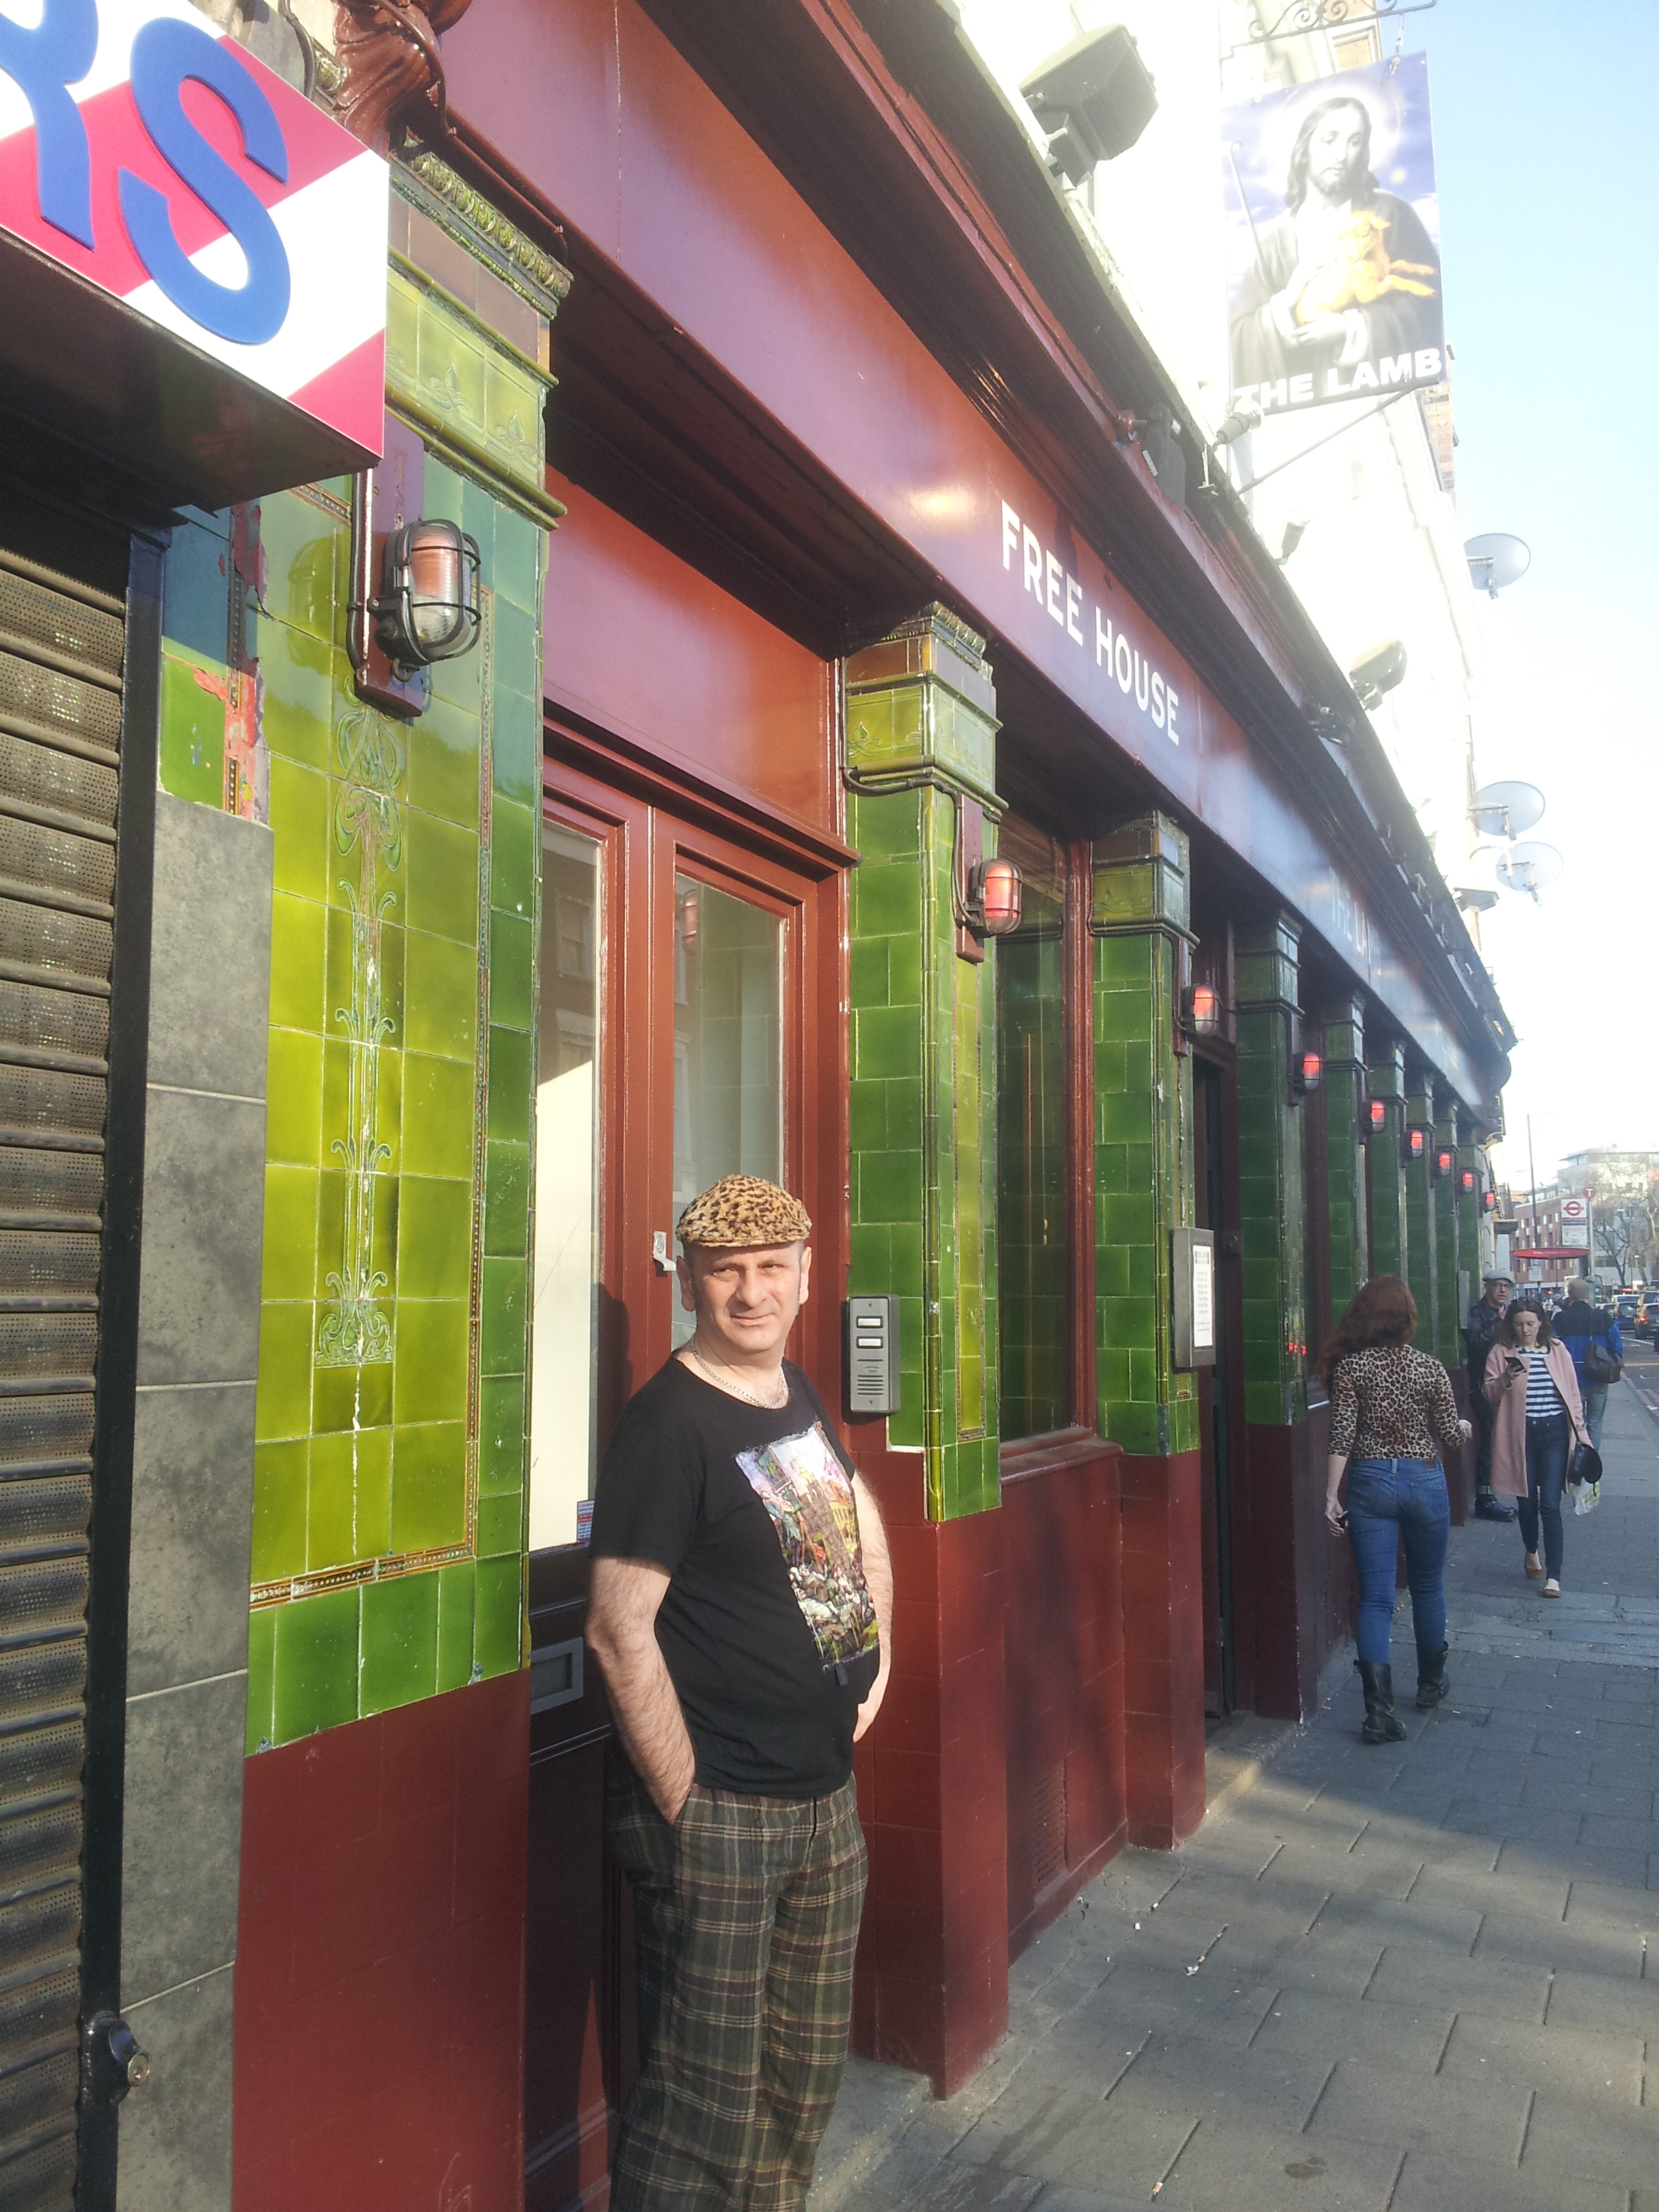 Ade Clarke: landlord at The Lamb Beer & Liquor – Islington Faces